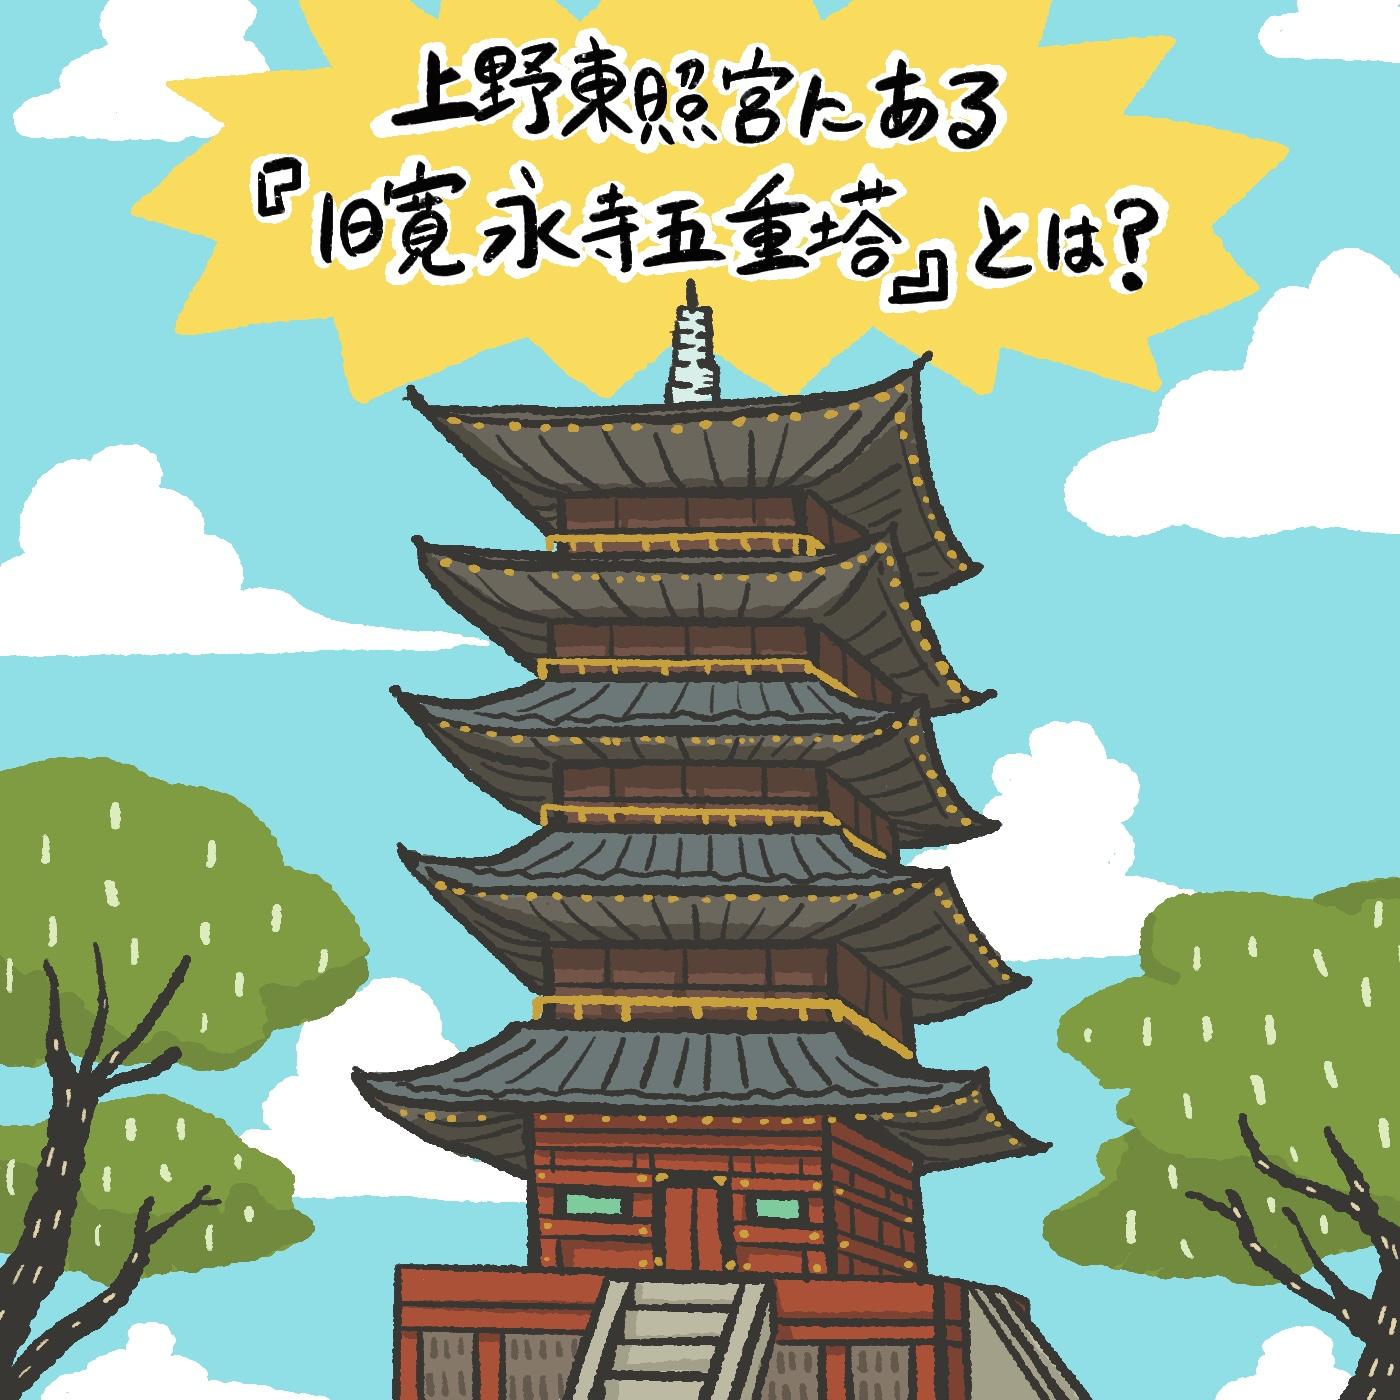 OBIKAKE ナニソレ 上野東照宮 旧寛永五重塔 藤野遼太